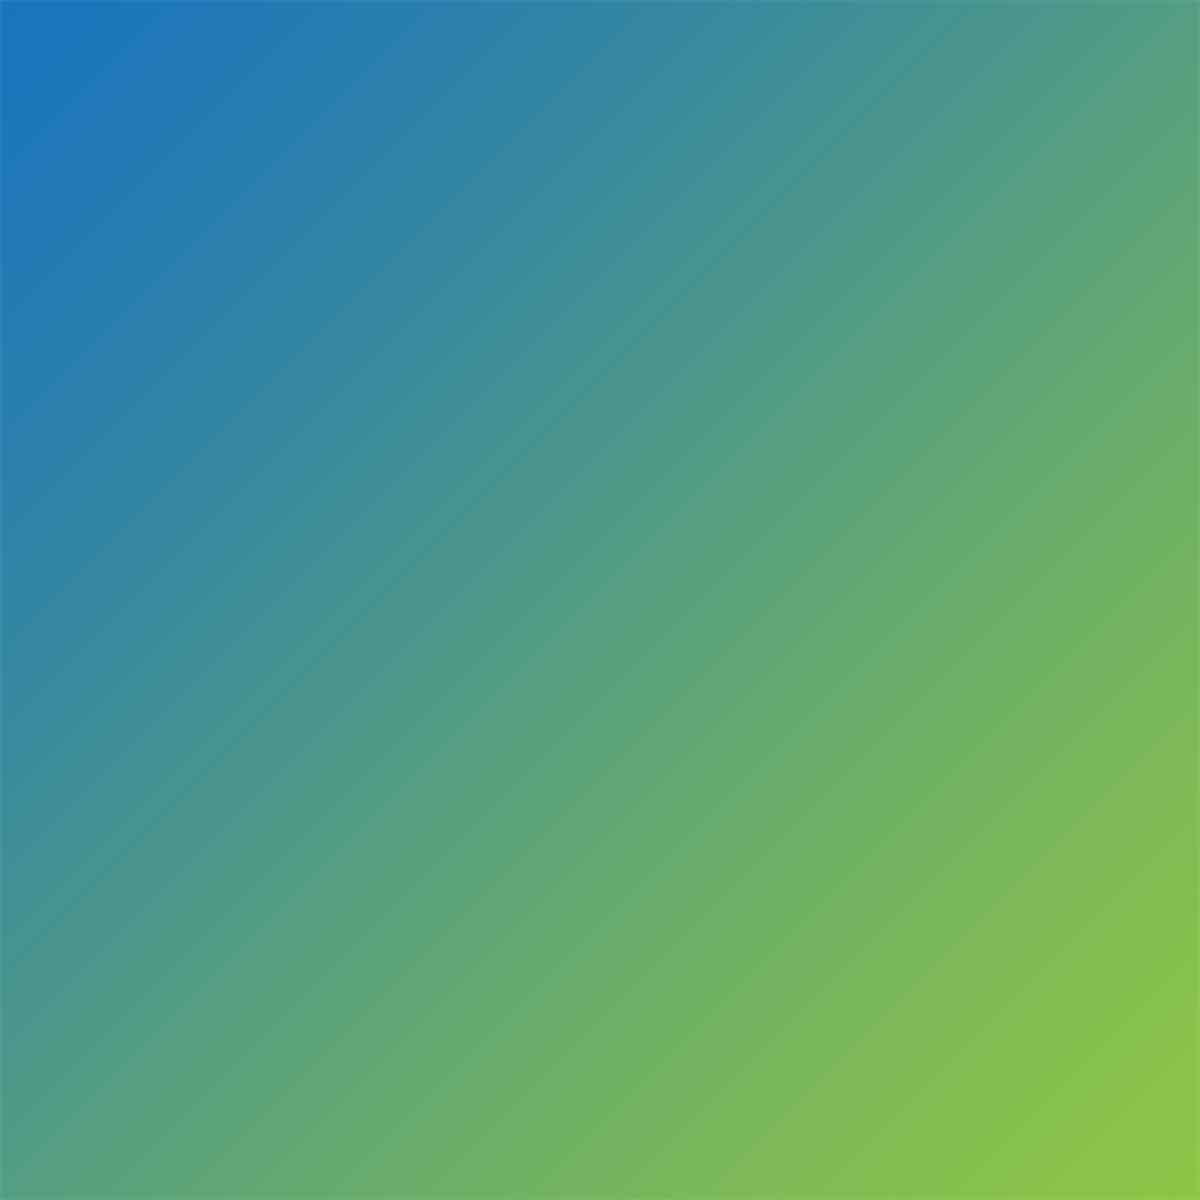 https://www.pugliaescursioni.com/wp-content/uploads/2018/09/bgn-image-box-gradient.jpg